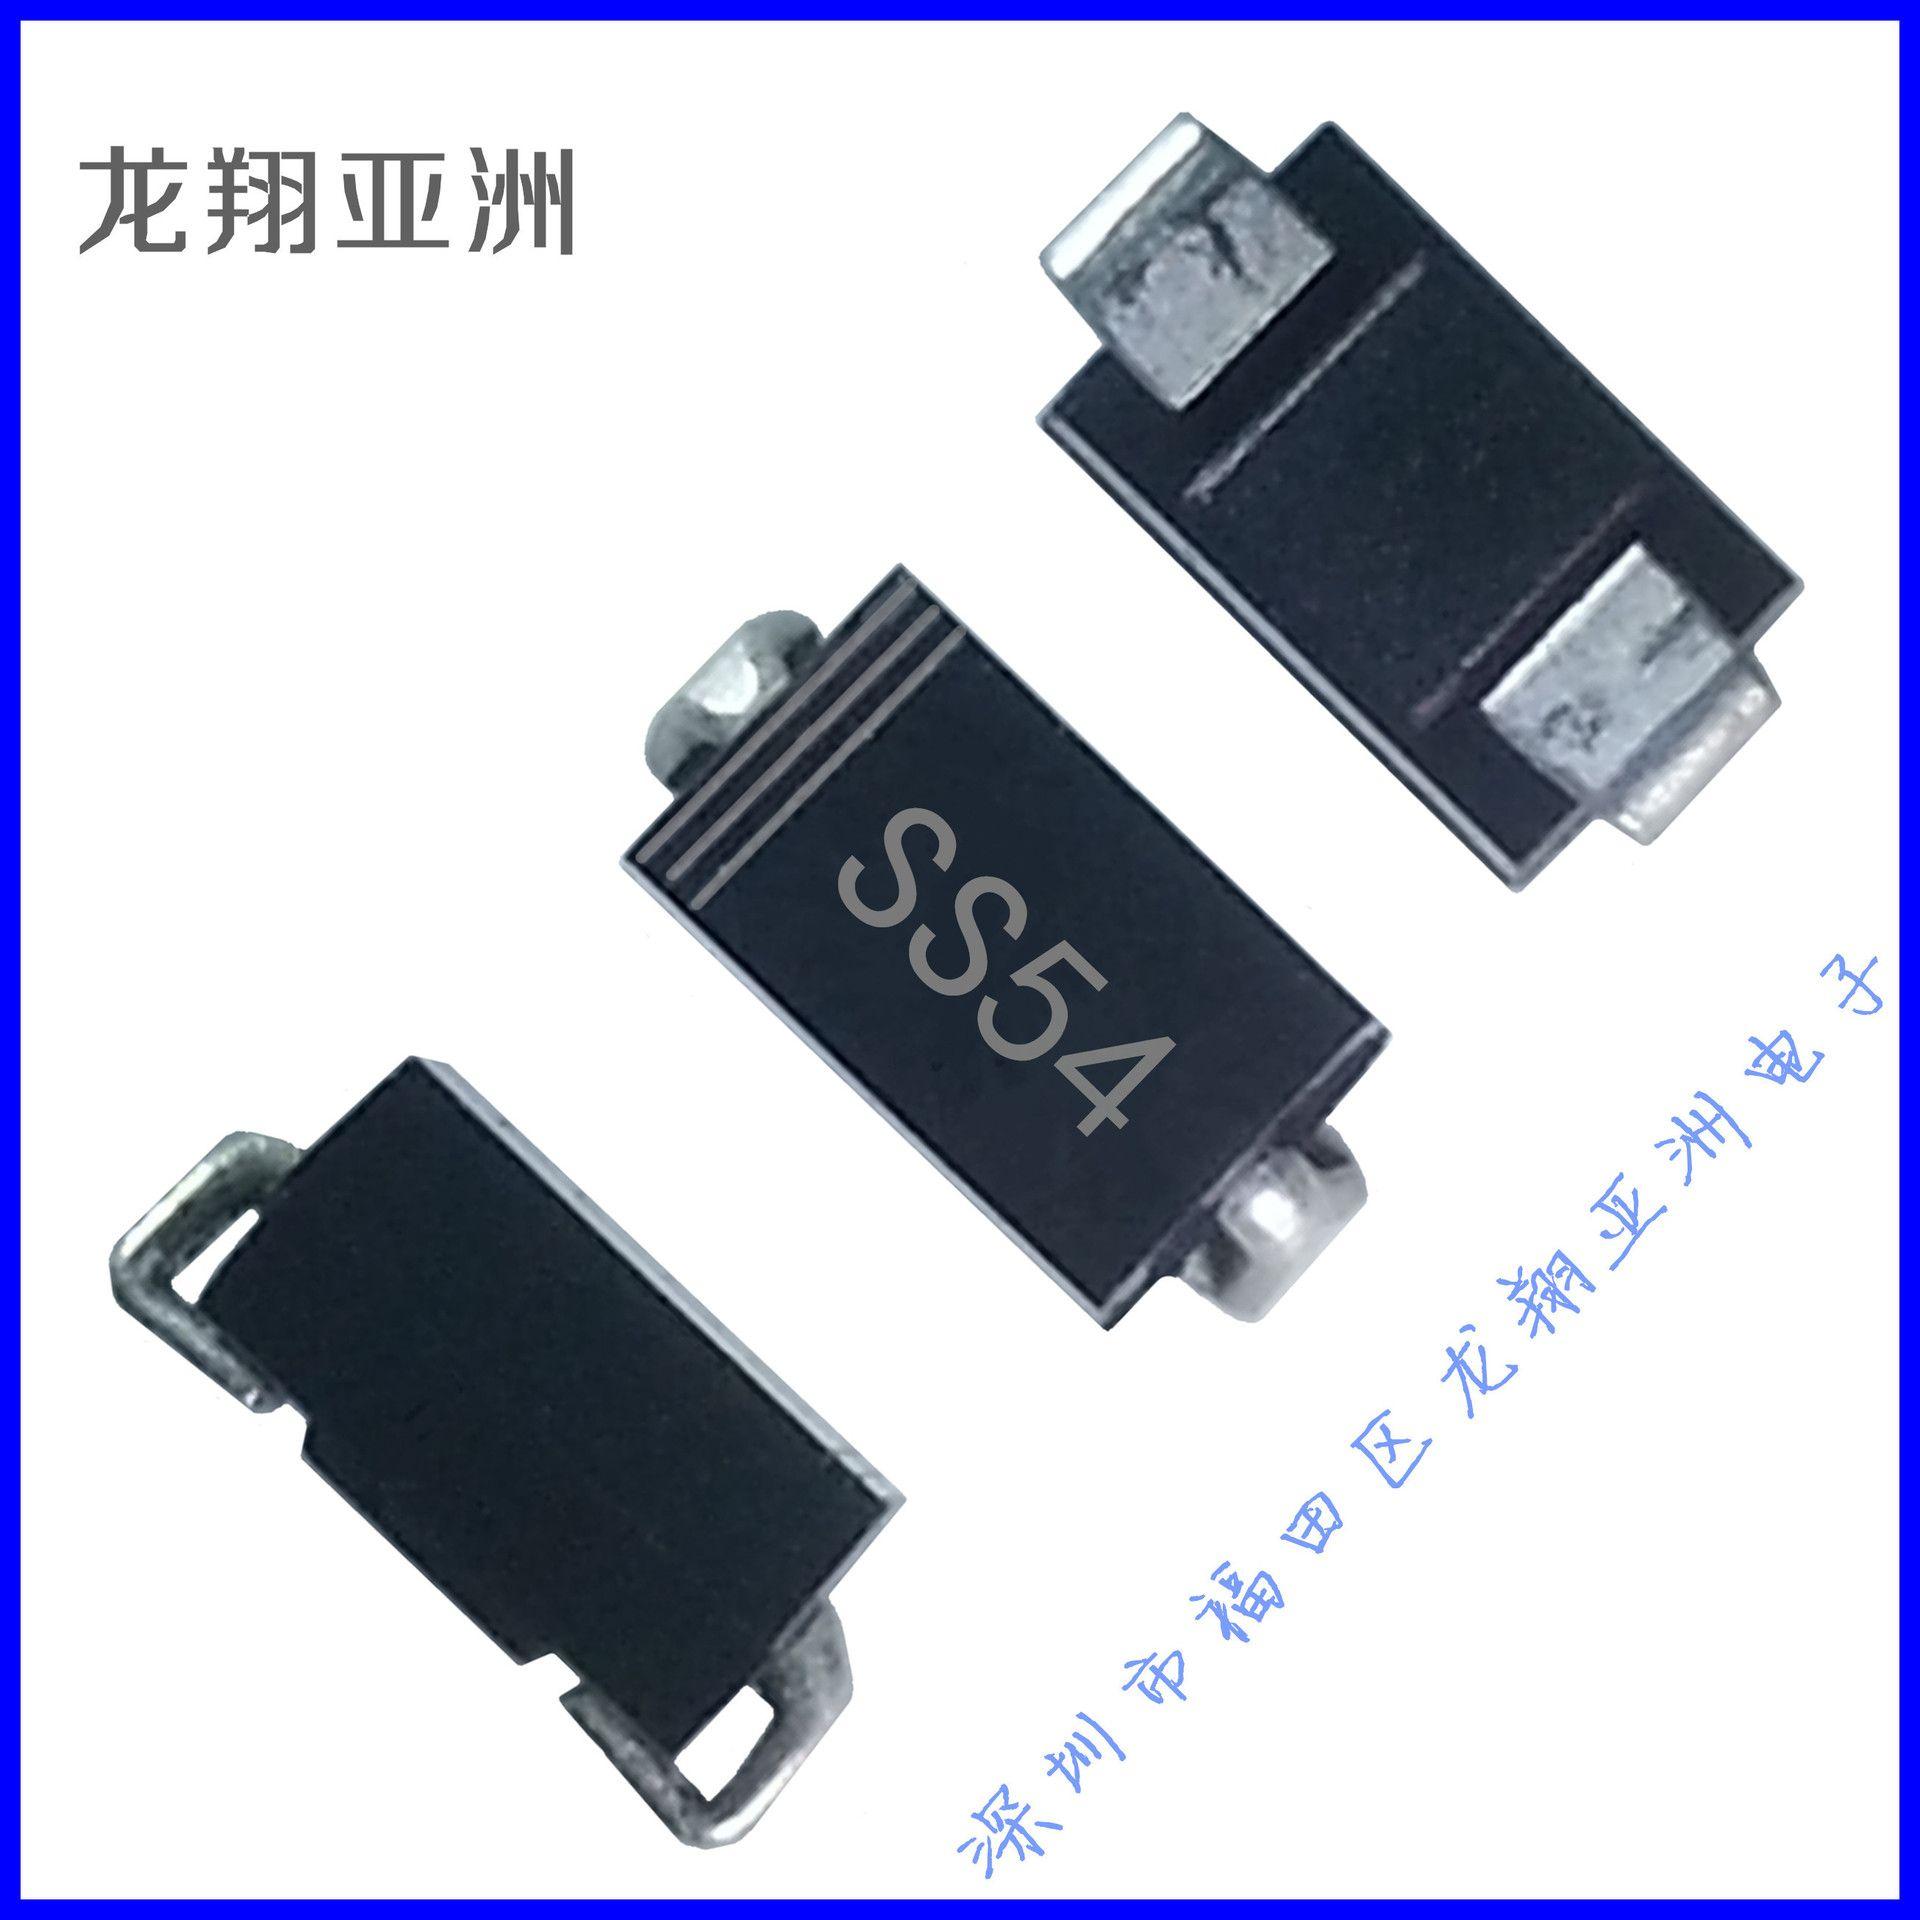 Großhandel Ss54 Schaltung Diode Elektronische Bauelemente Sr540 Ss54 ...